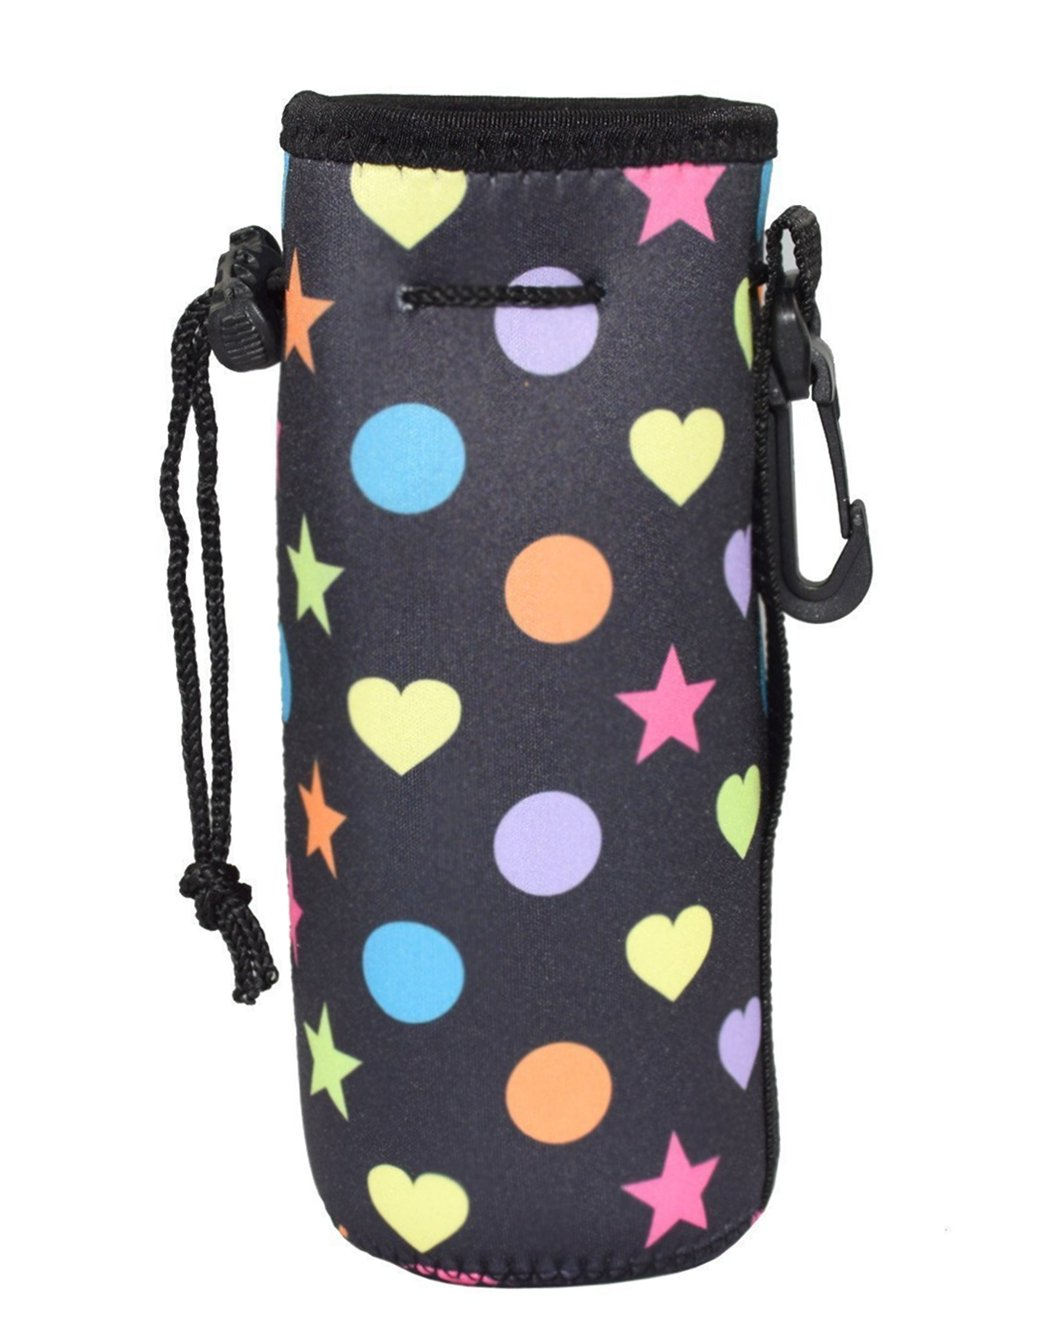 Protable Neoprene Insulated Water Bottle Cooler Cooler Carrier Cover Sleeve Tote Bag Pouch Holder Strap for Kid Children Women Men Biker Orchidtent Water Bottle Sleeve